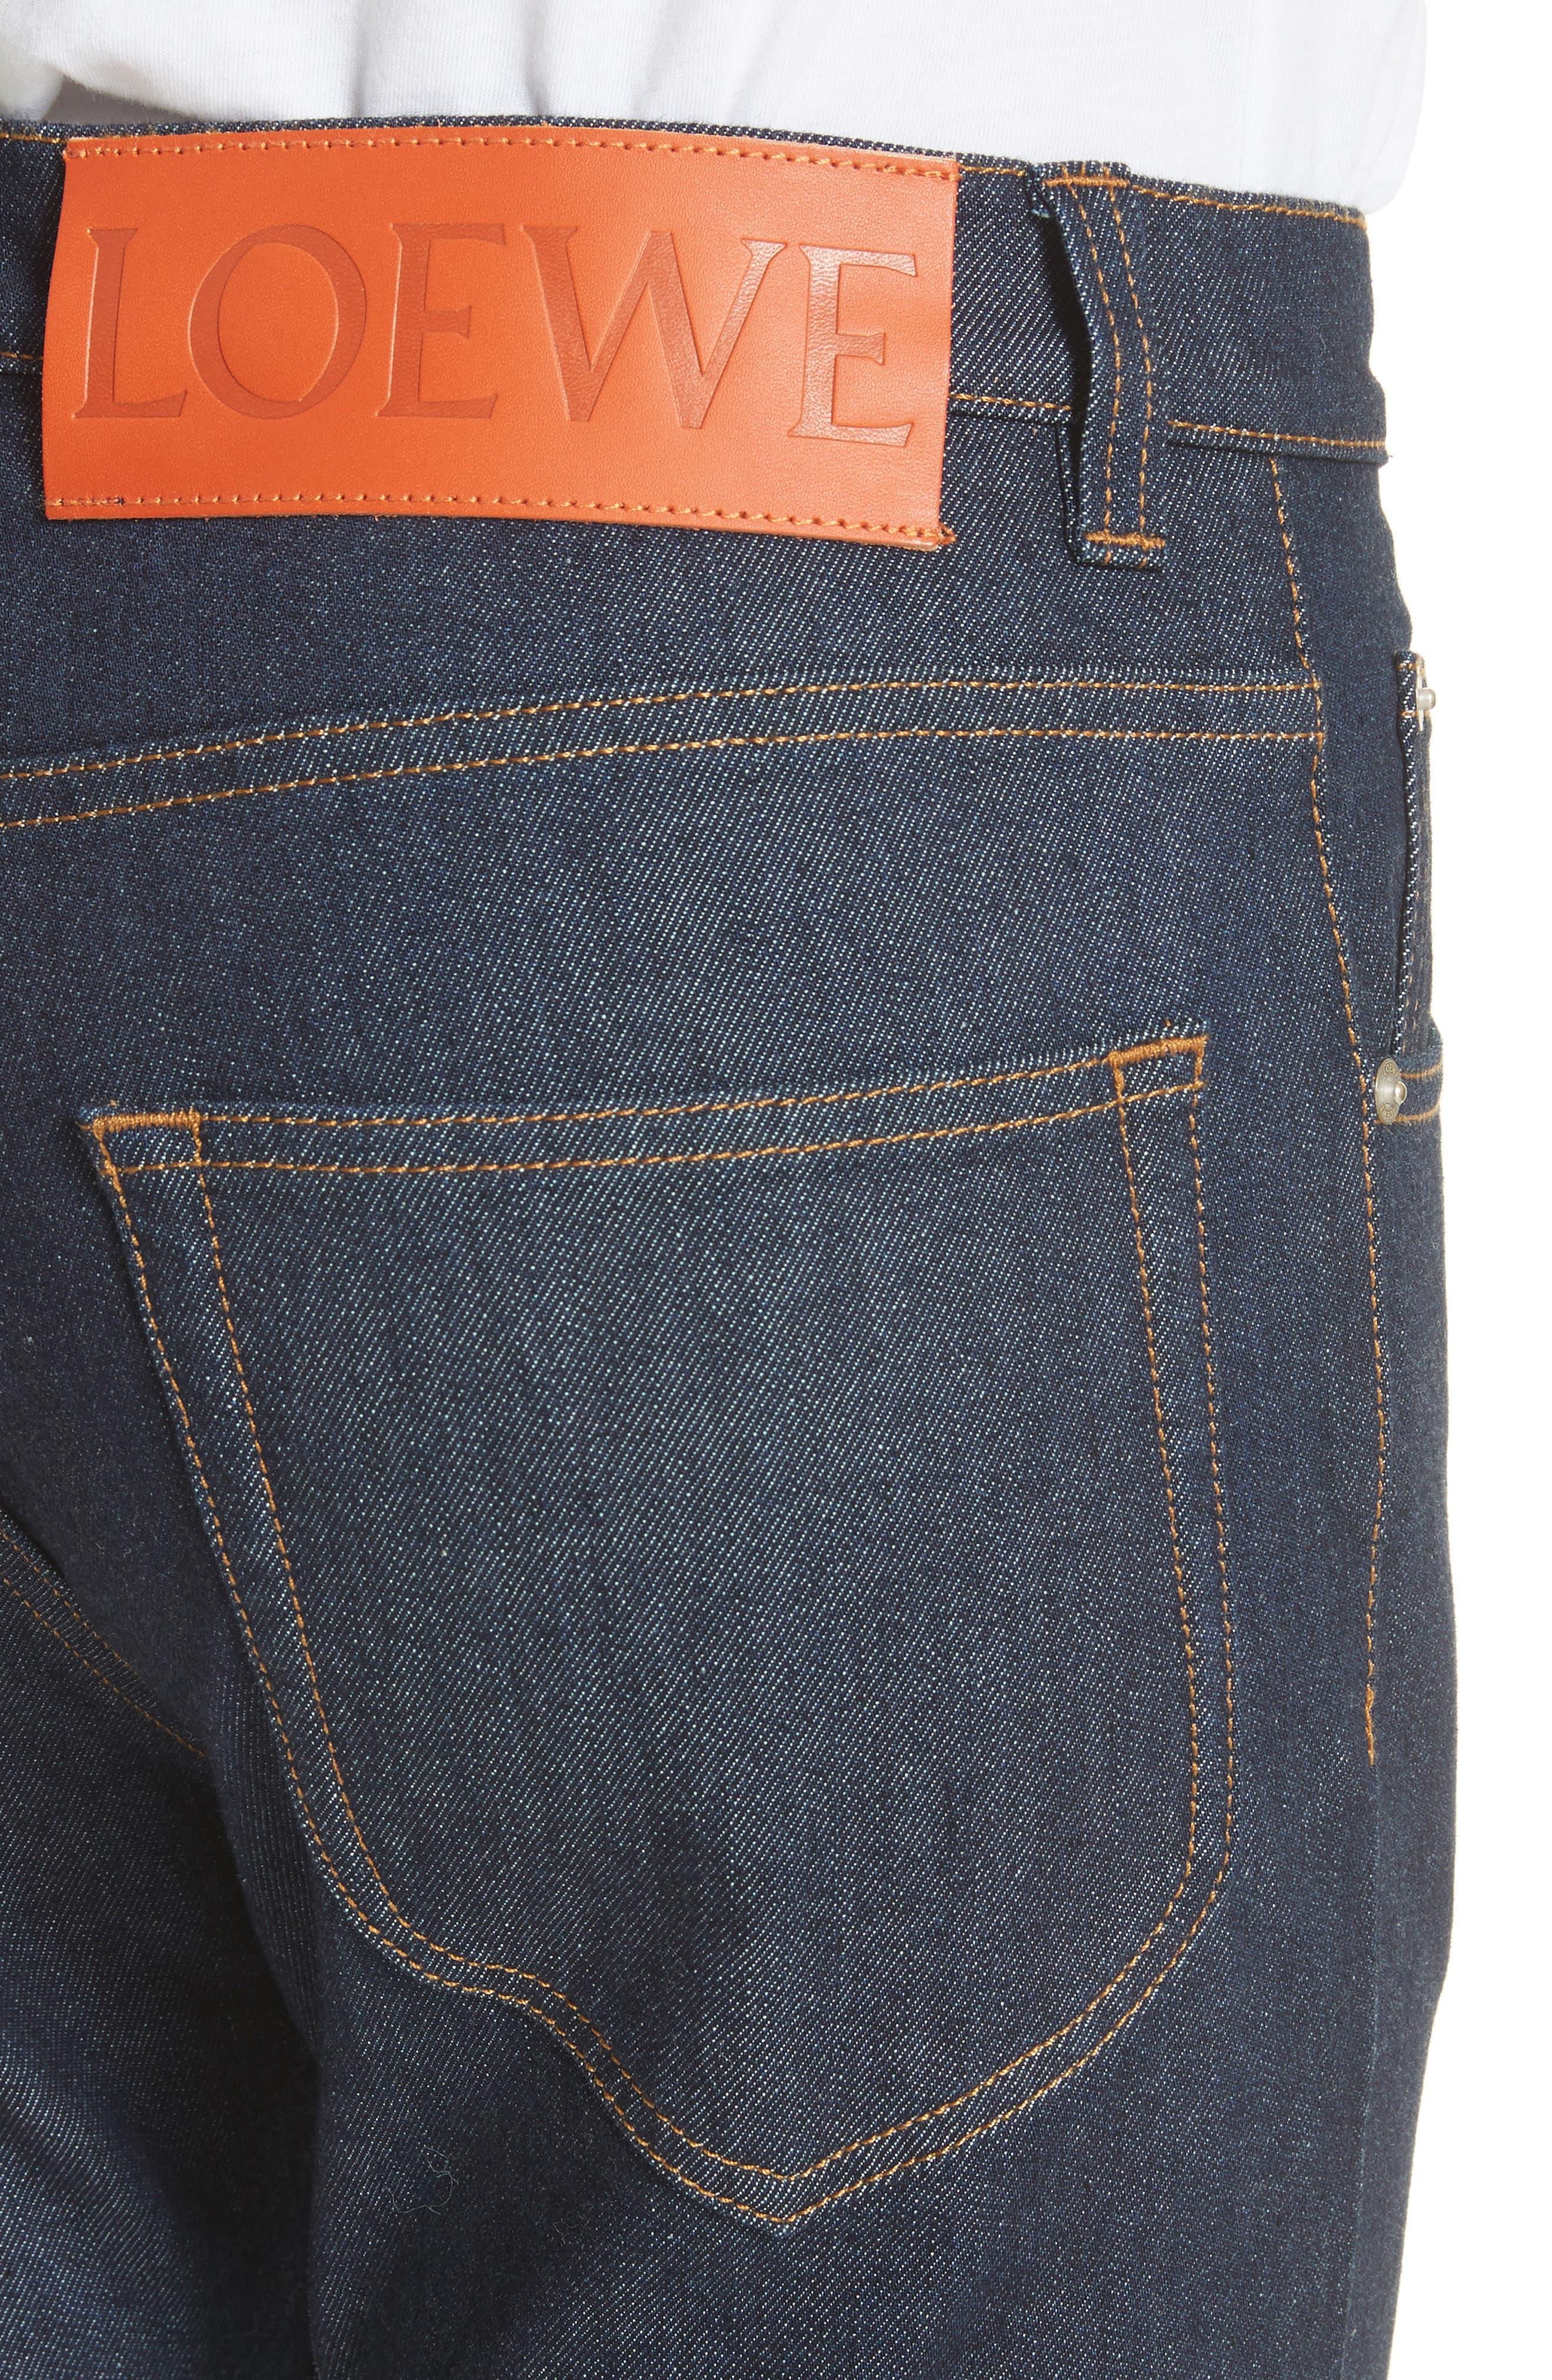 LOEWE, Skinny Fit Jeans, Alternate thumbnail 4, color, BLUE DENIM